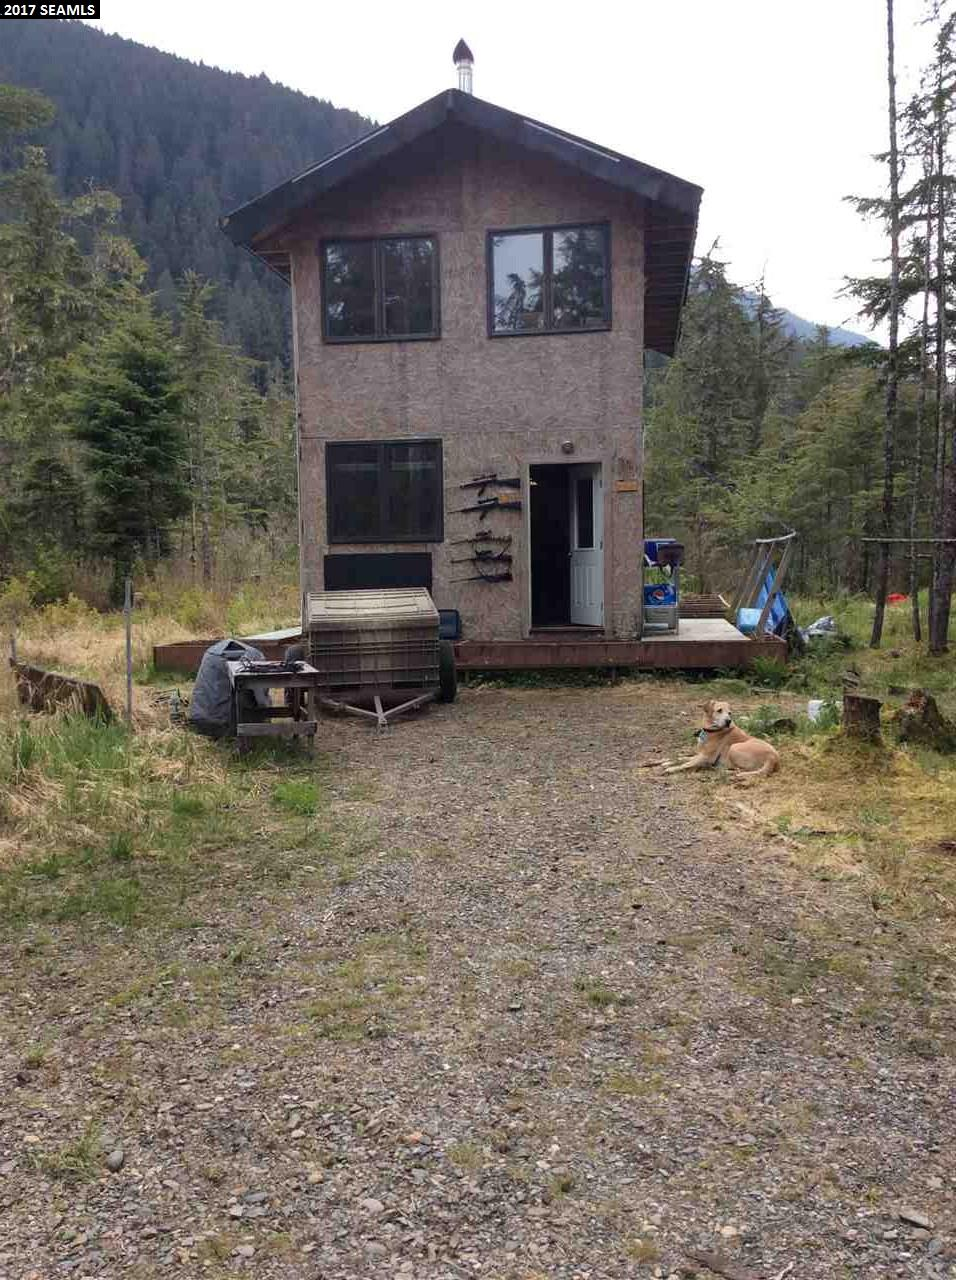 Alaska Dream Home - 16735_Great Alaska Dream Home - 16735  Pic_315729.JPG